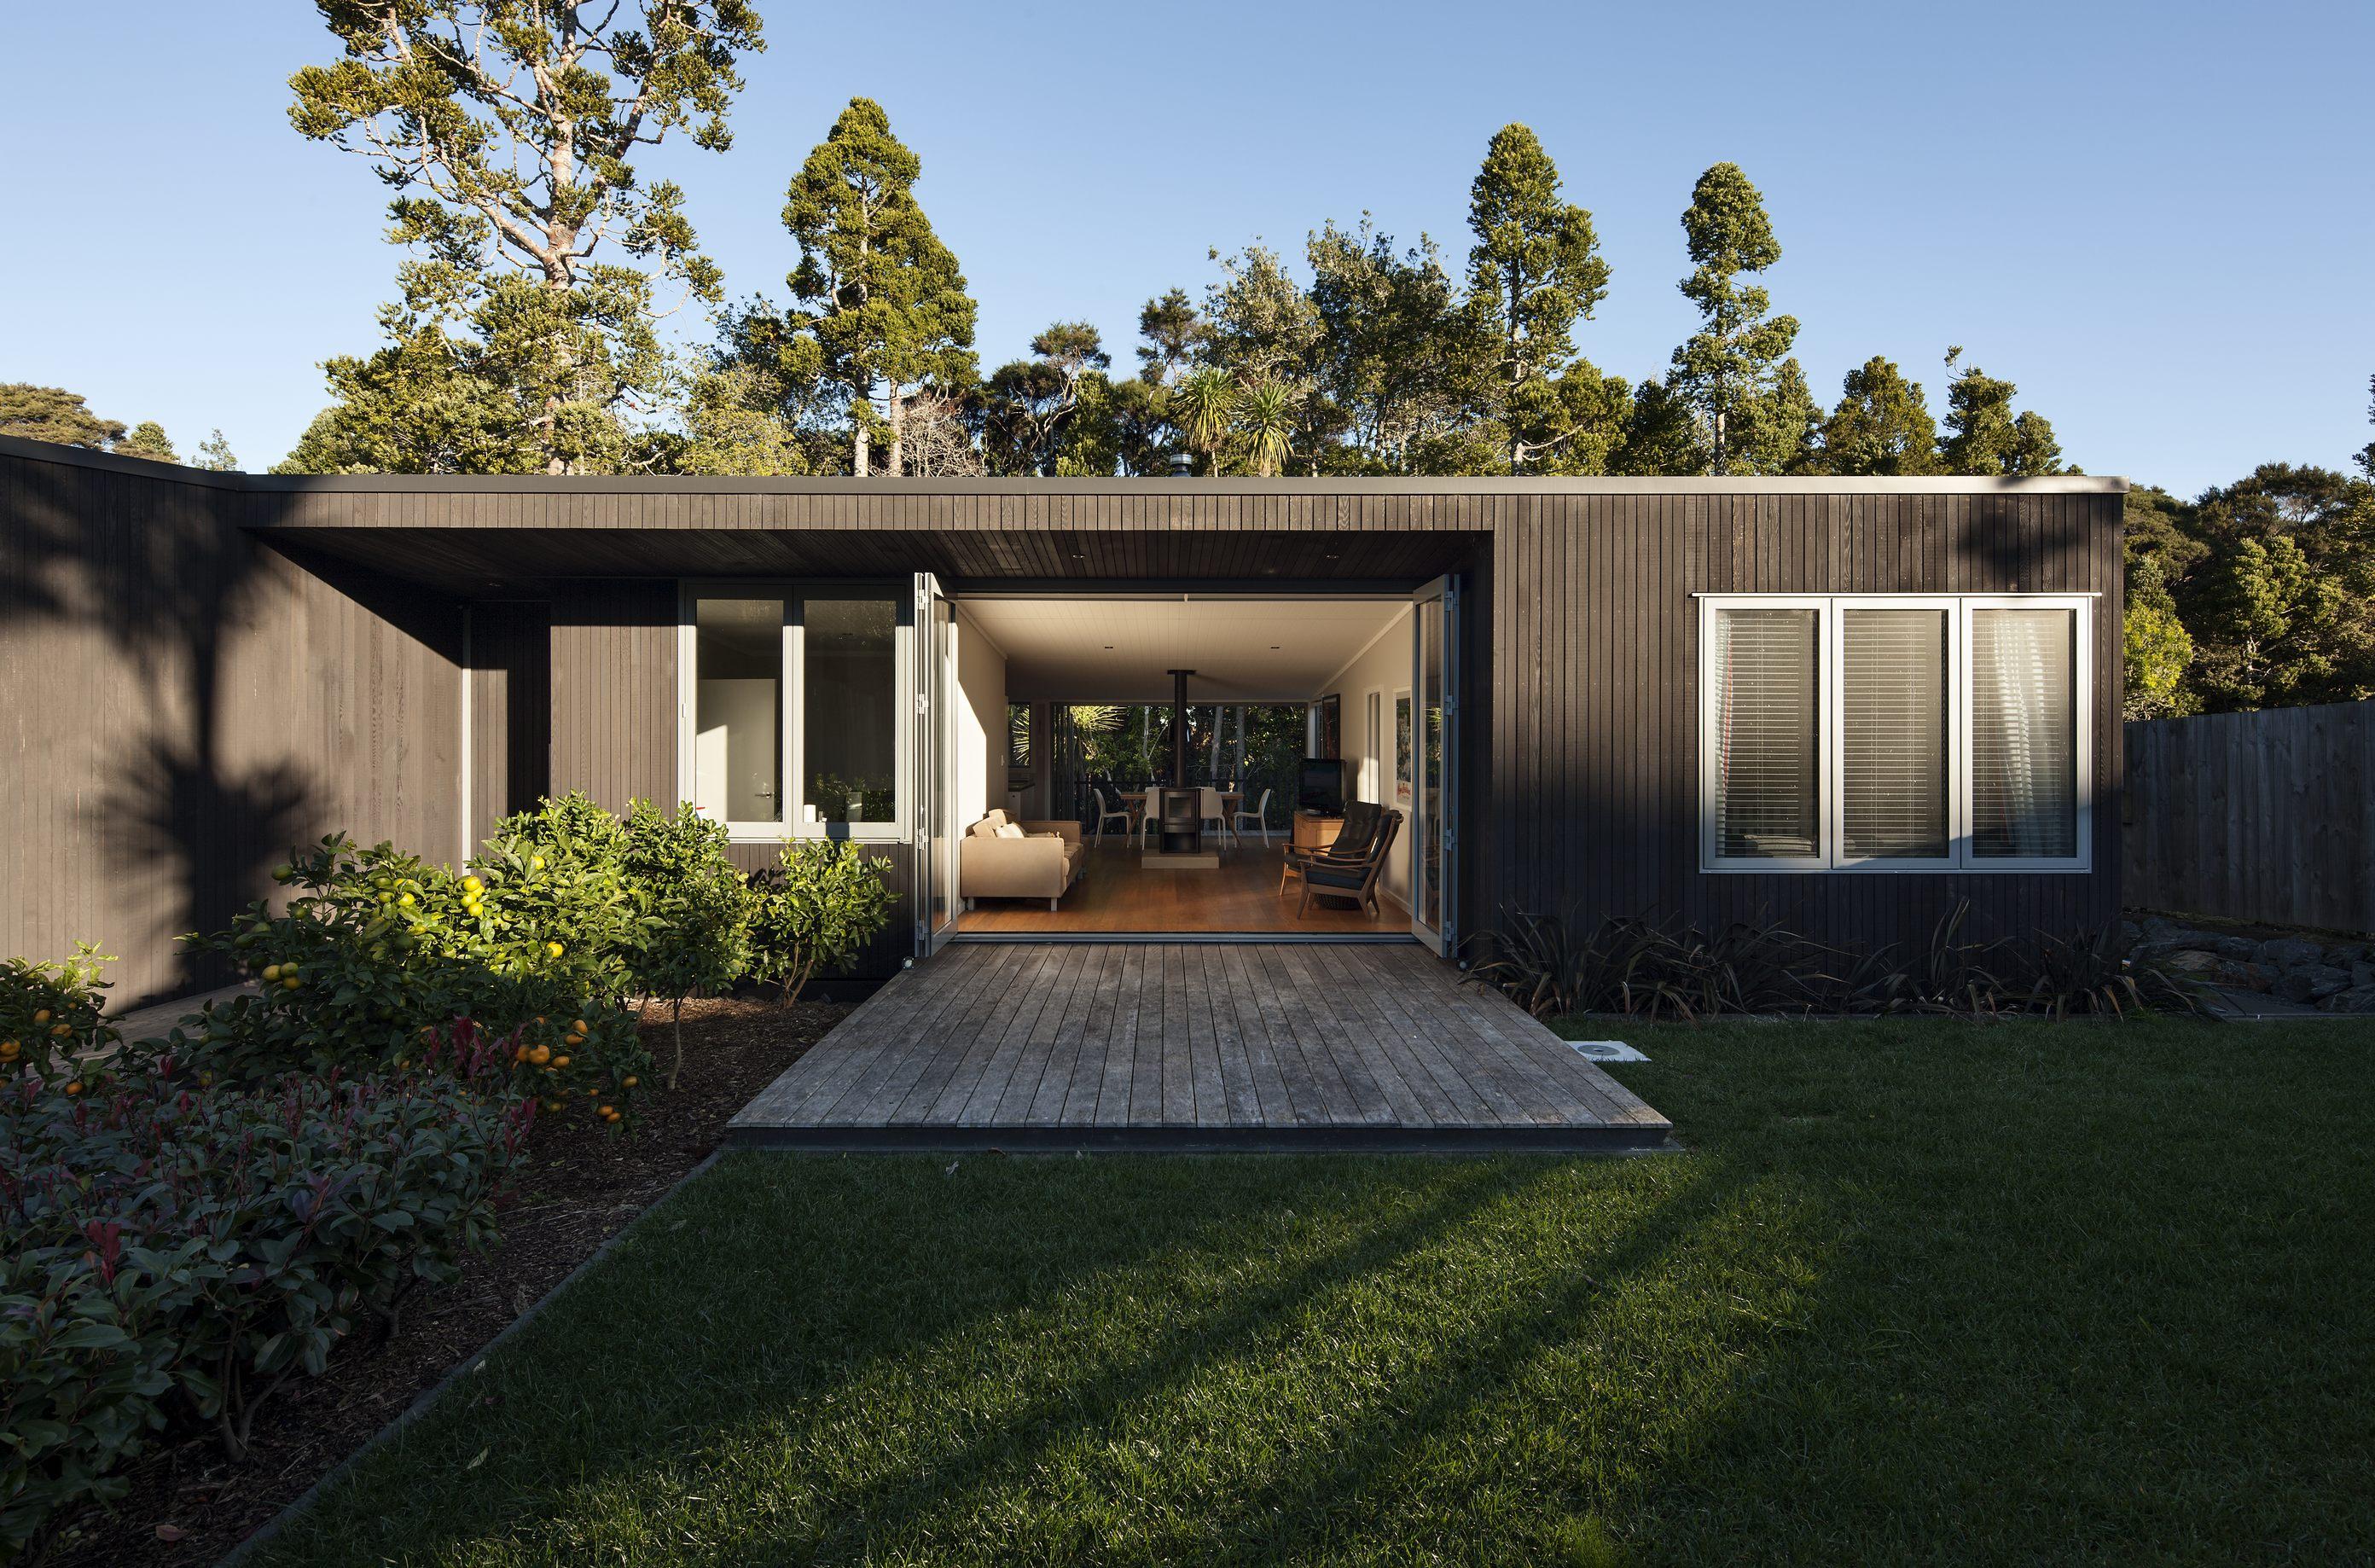 Cedar cladding Auckland house construction complete